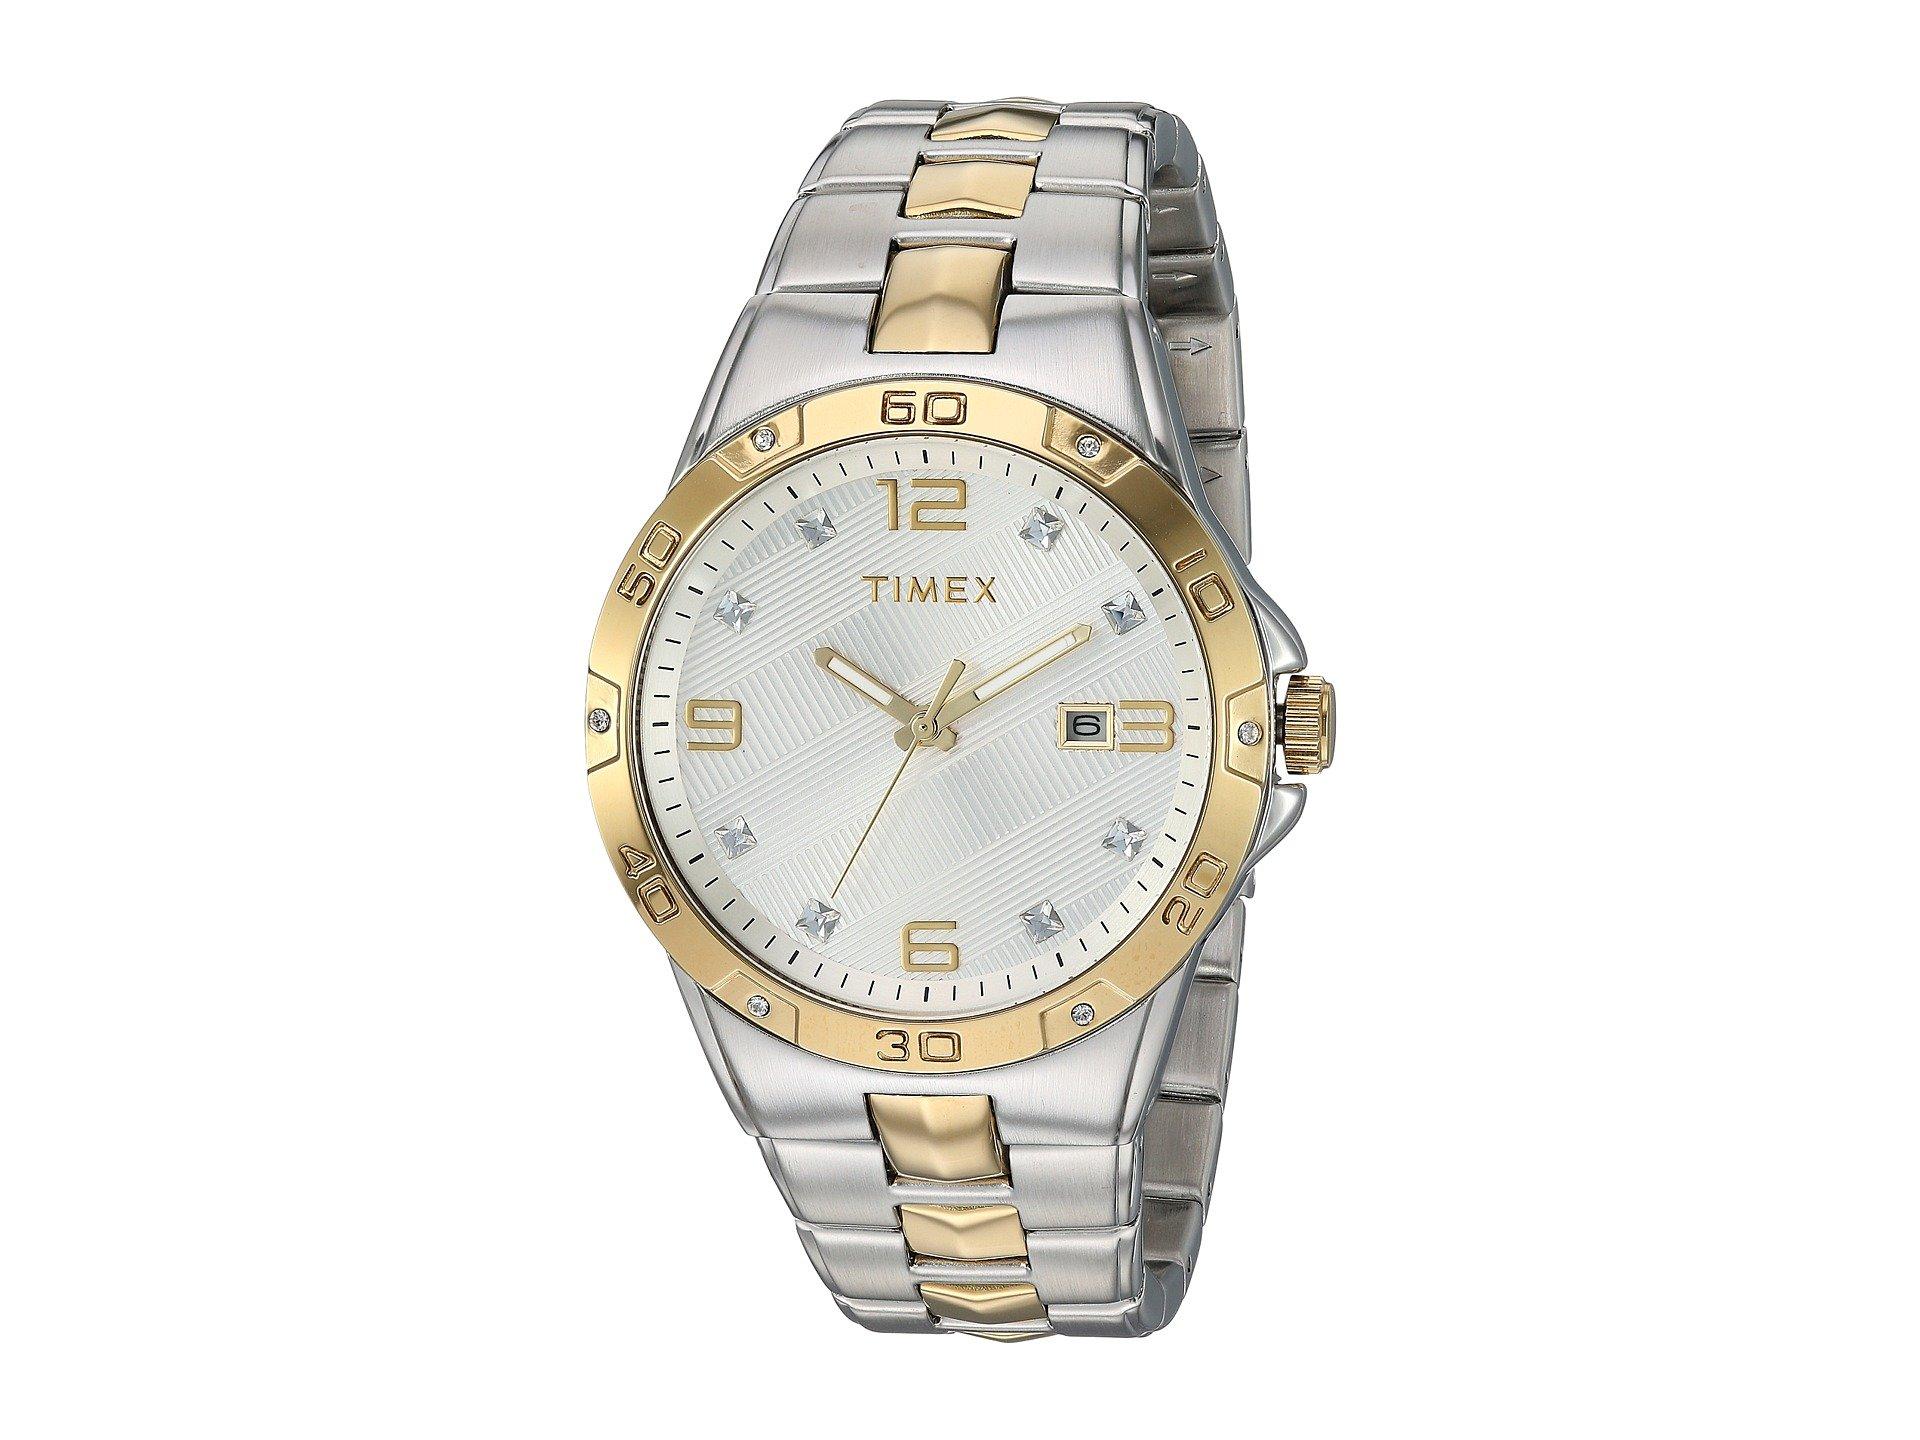 Reloj para Hombre Timex Mens Two-Tone Crystal  + Timex en VeoyCompro.net